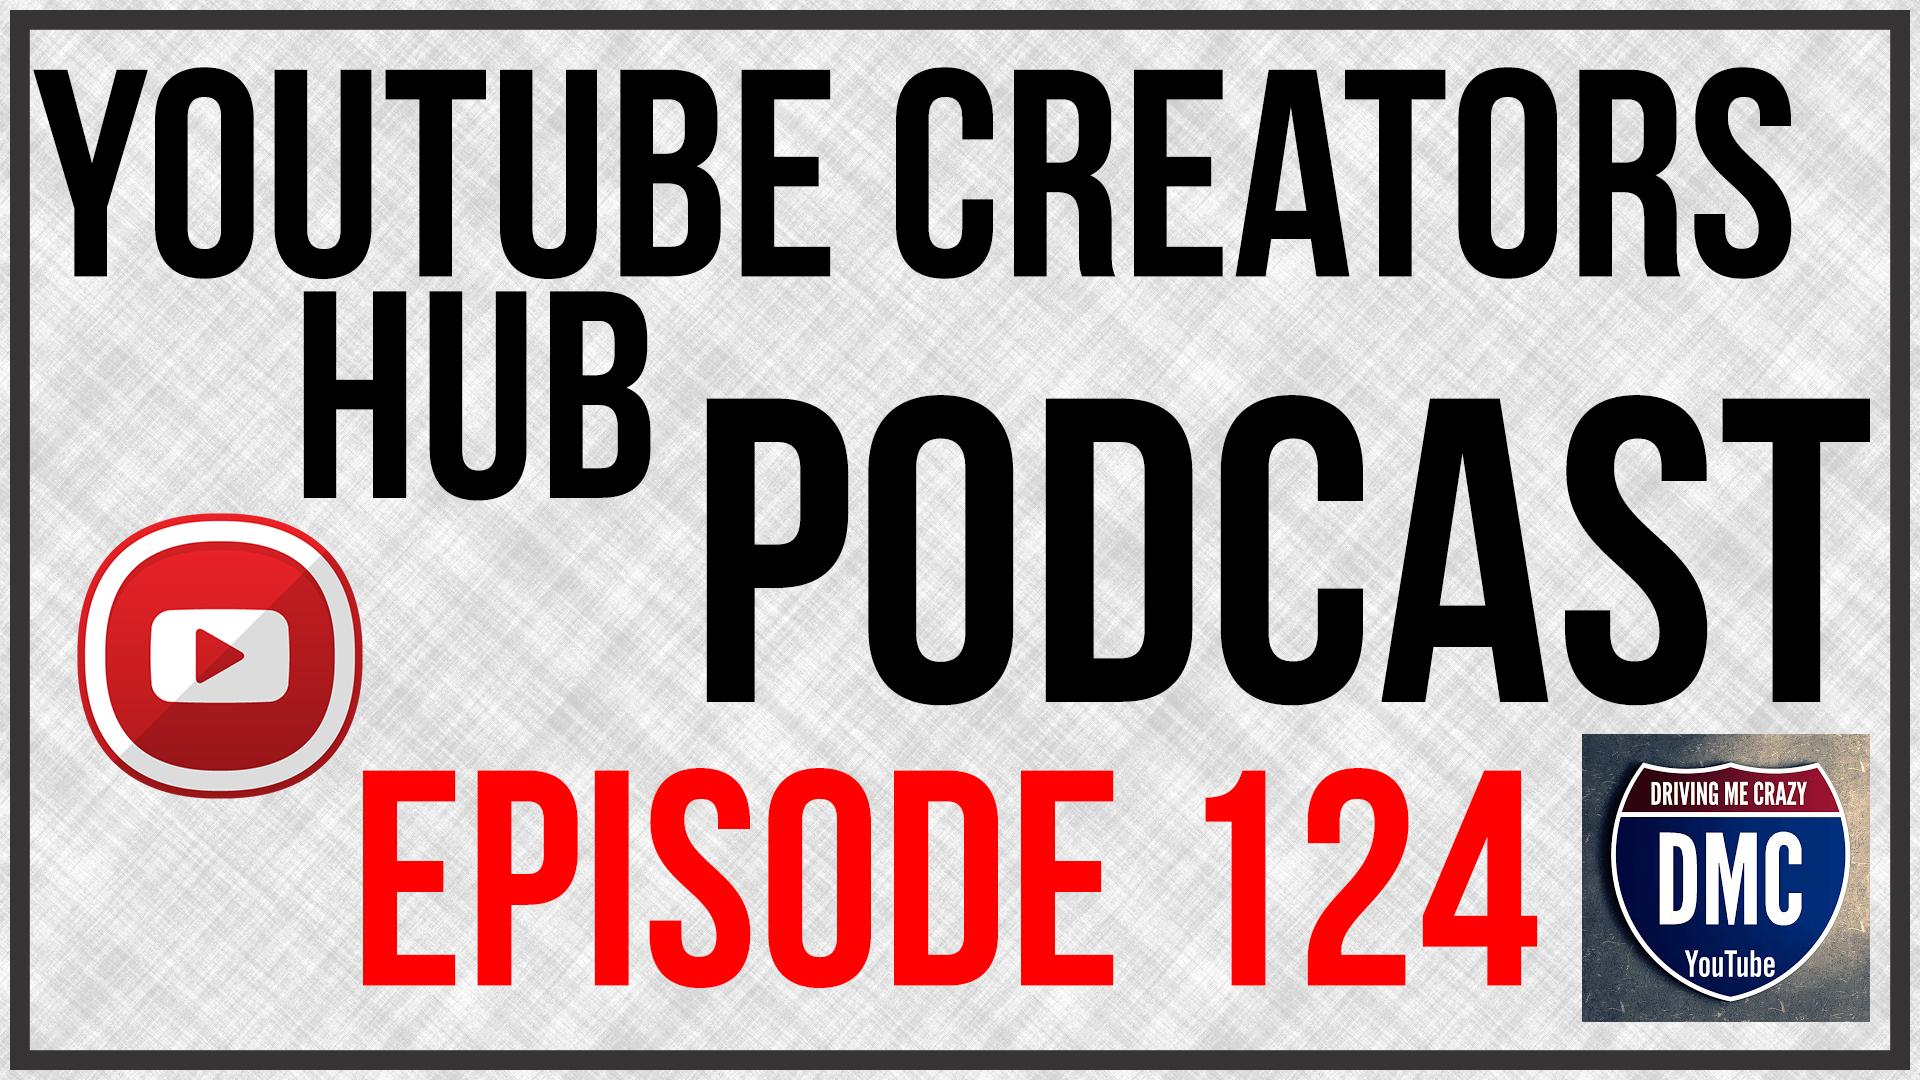 YTCH Podcast Episode 124